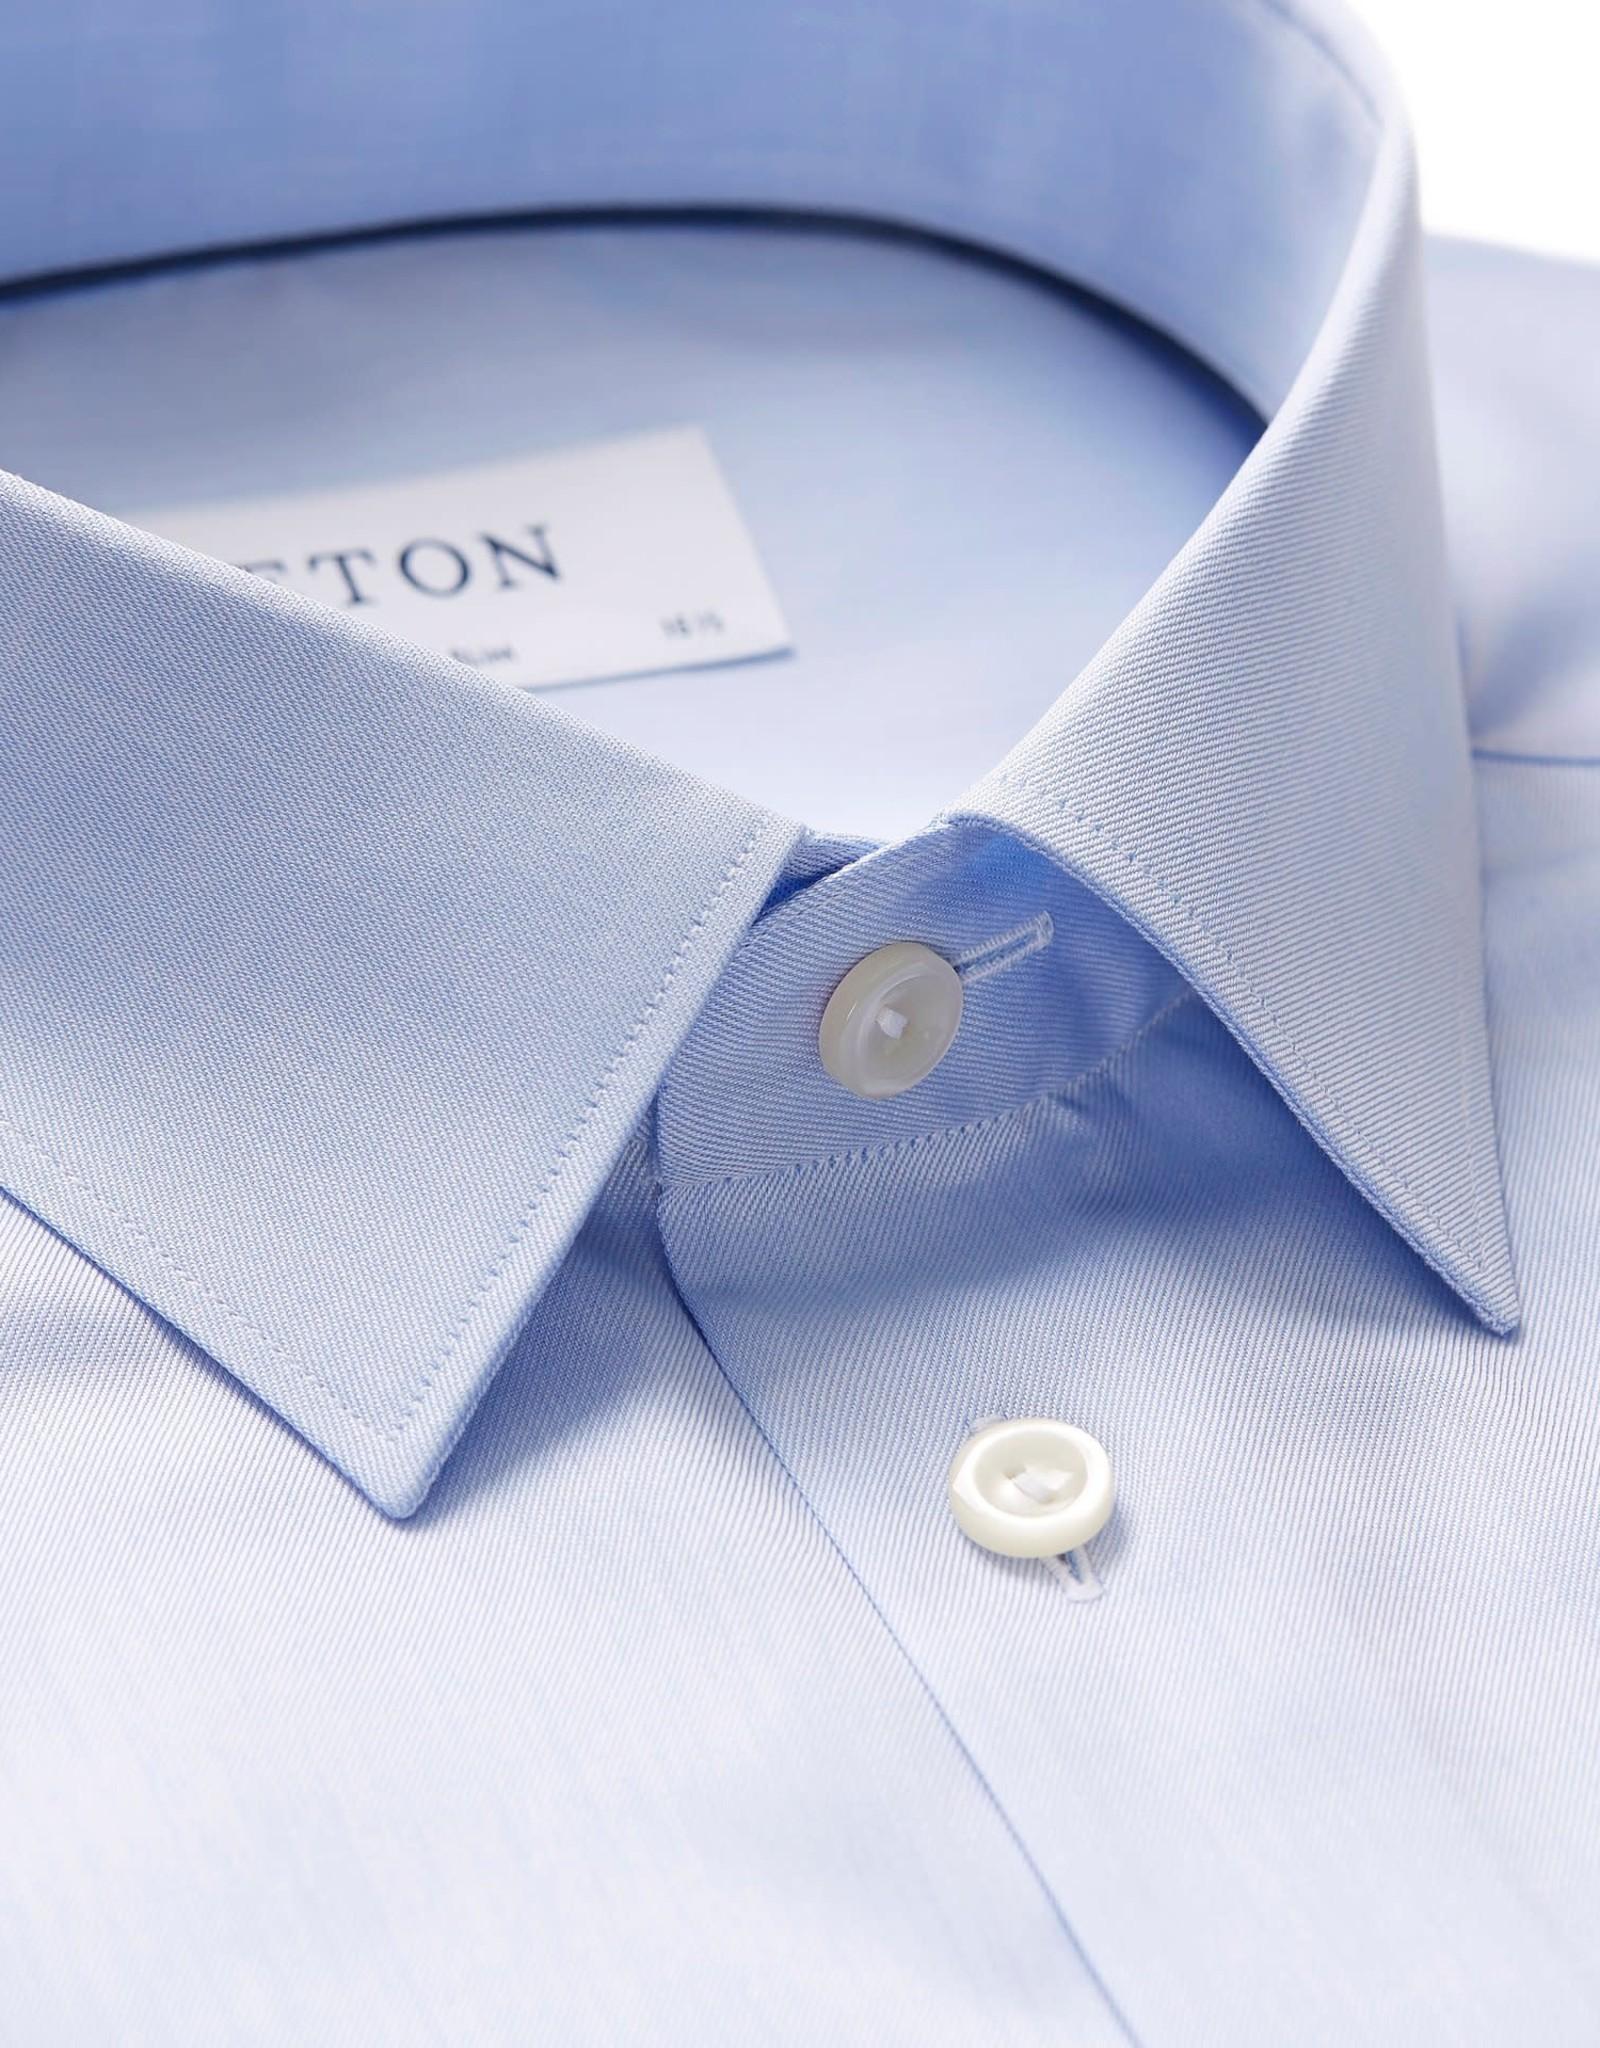 Eton Eton hemd blauw super slim 3000-88811/21